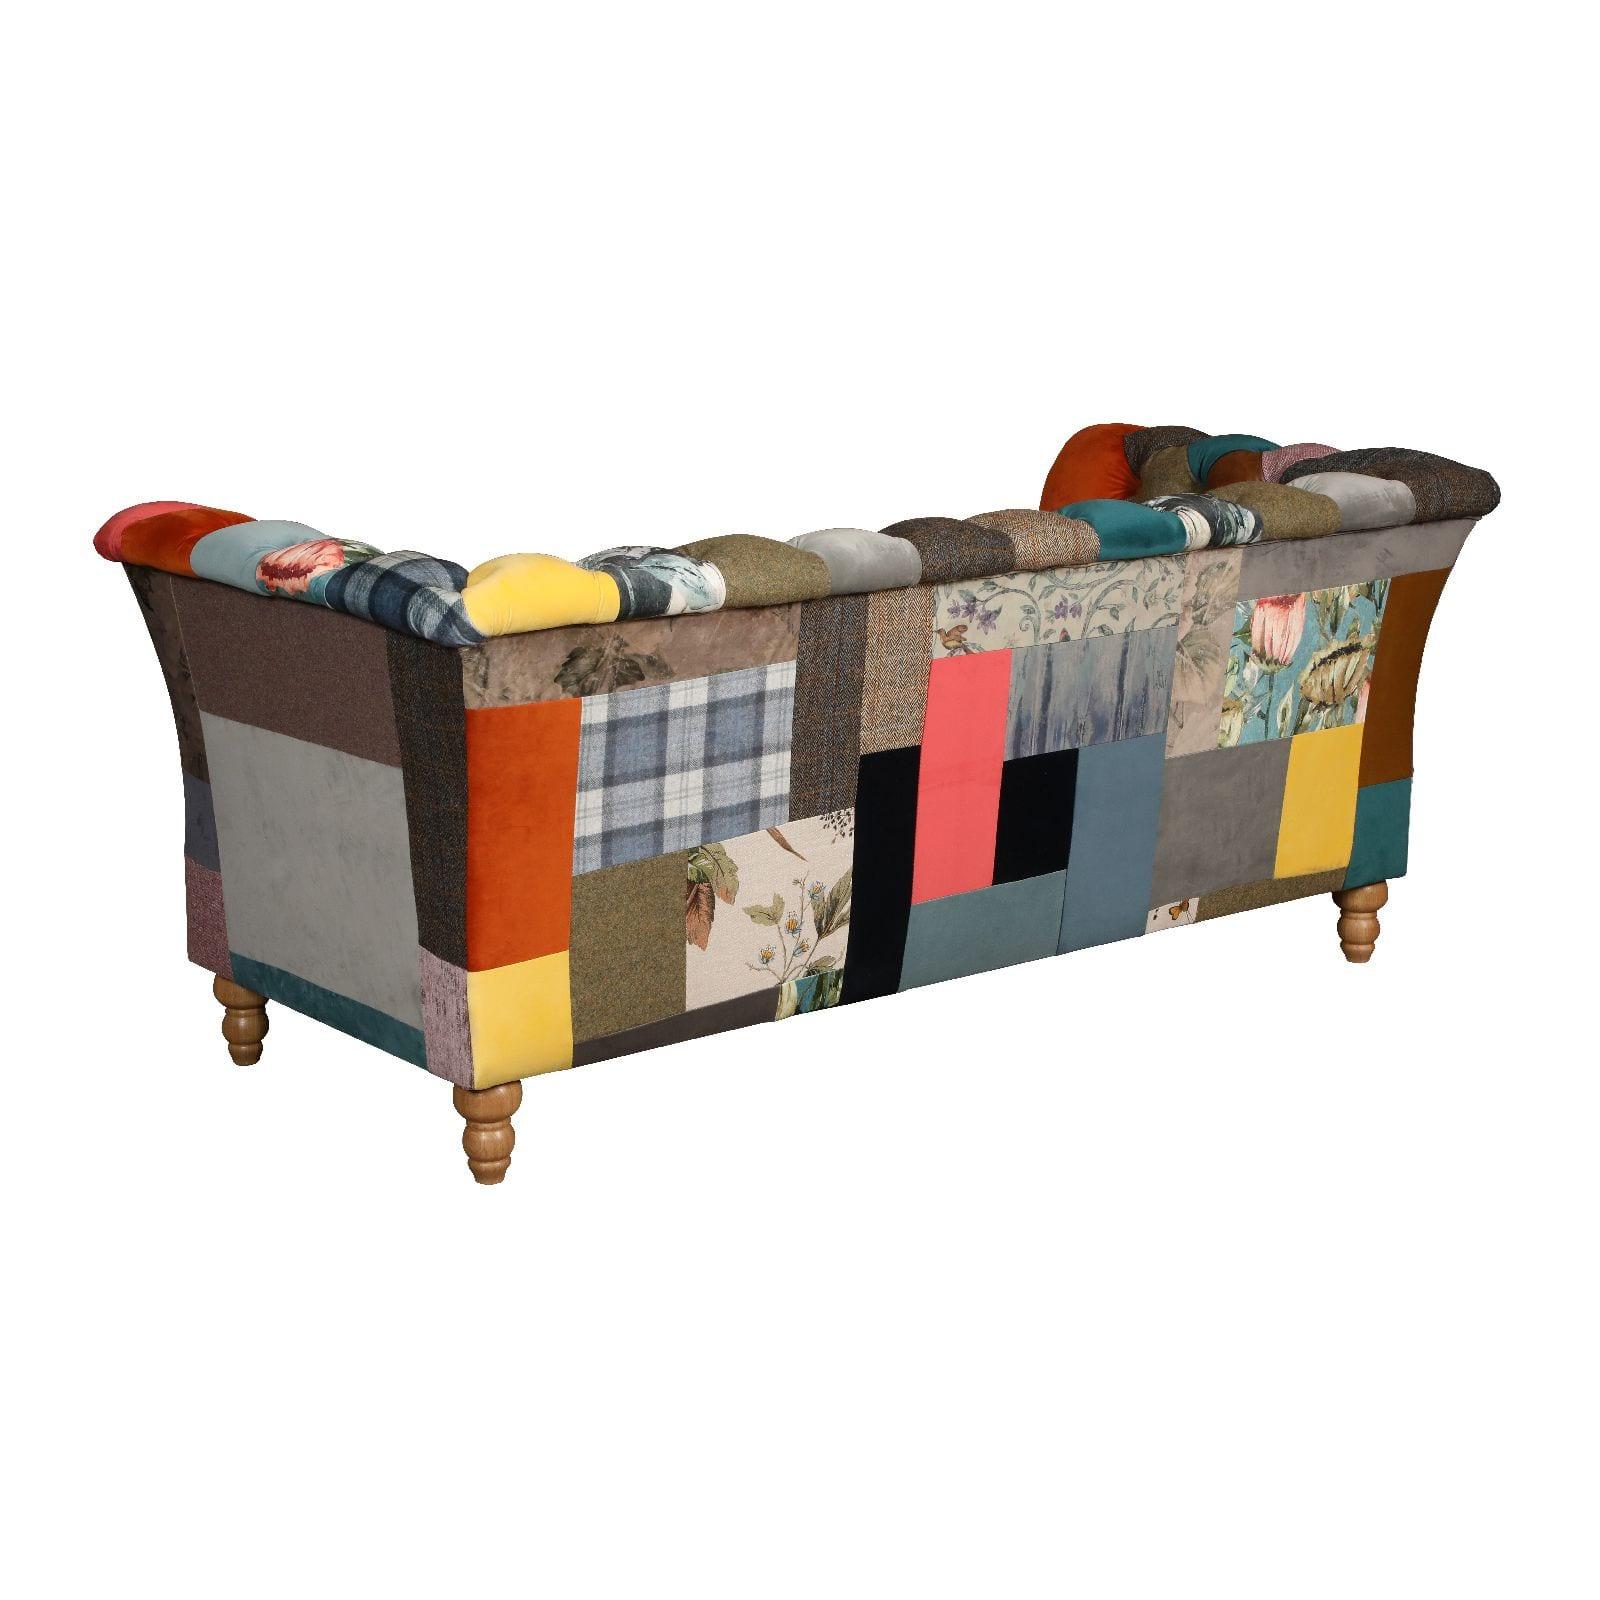 Rutland patchwork sofa